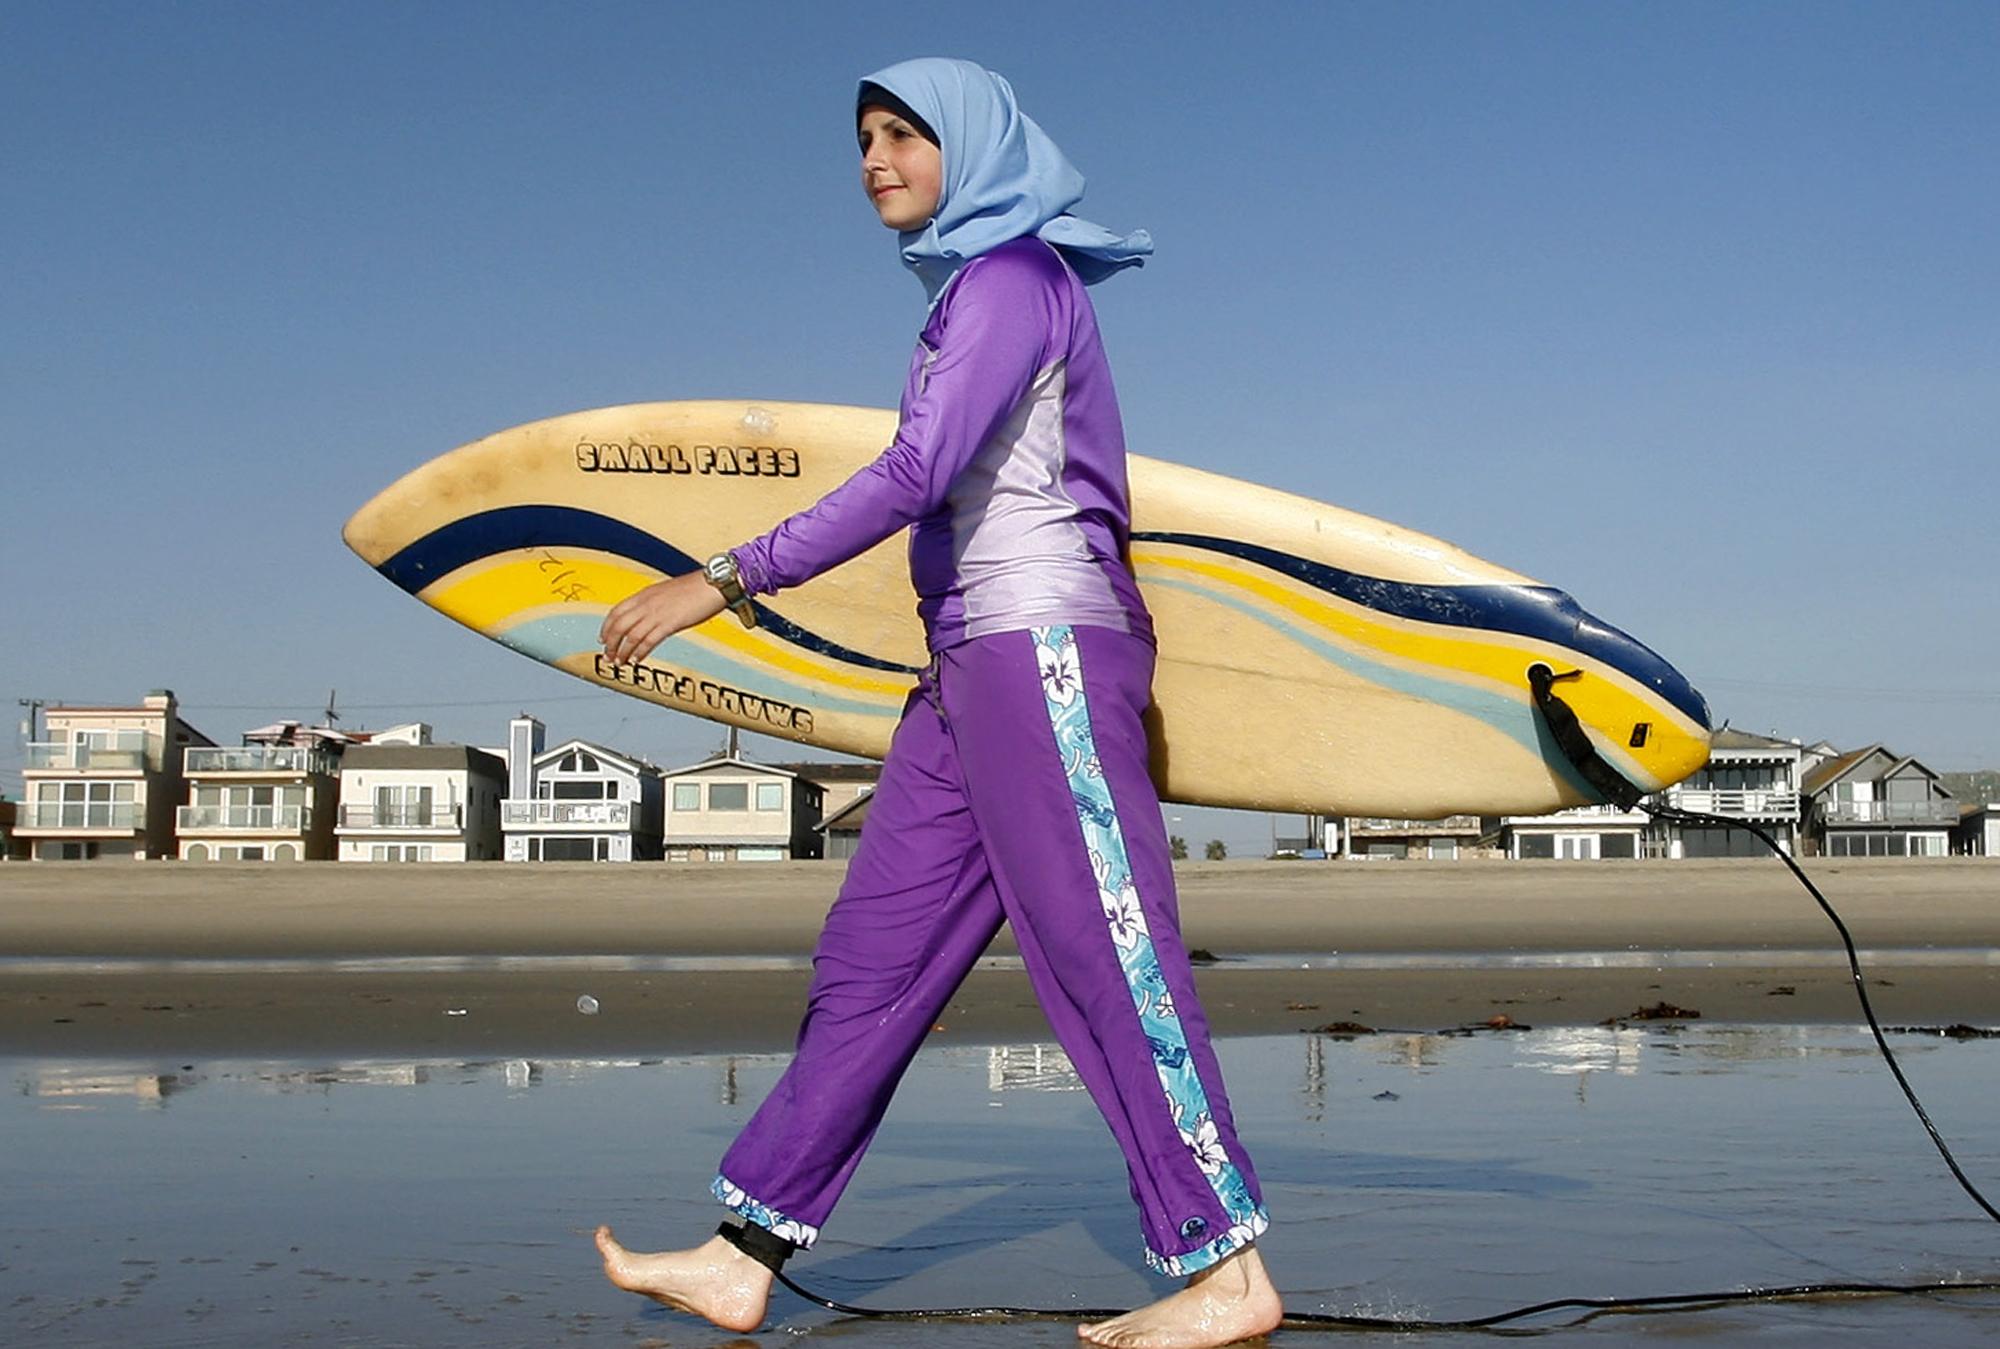 Sama Wareh walks along a California beach in swimwear designed for Muslim women. The photo is from 2007. (Chris Carlson/Associated Press)